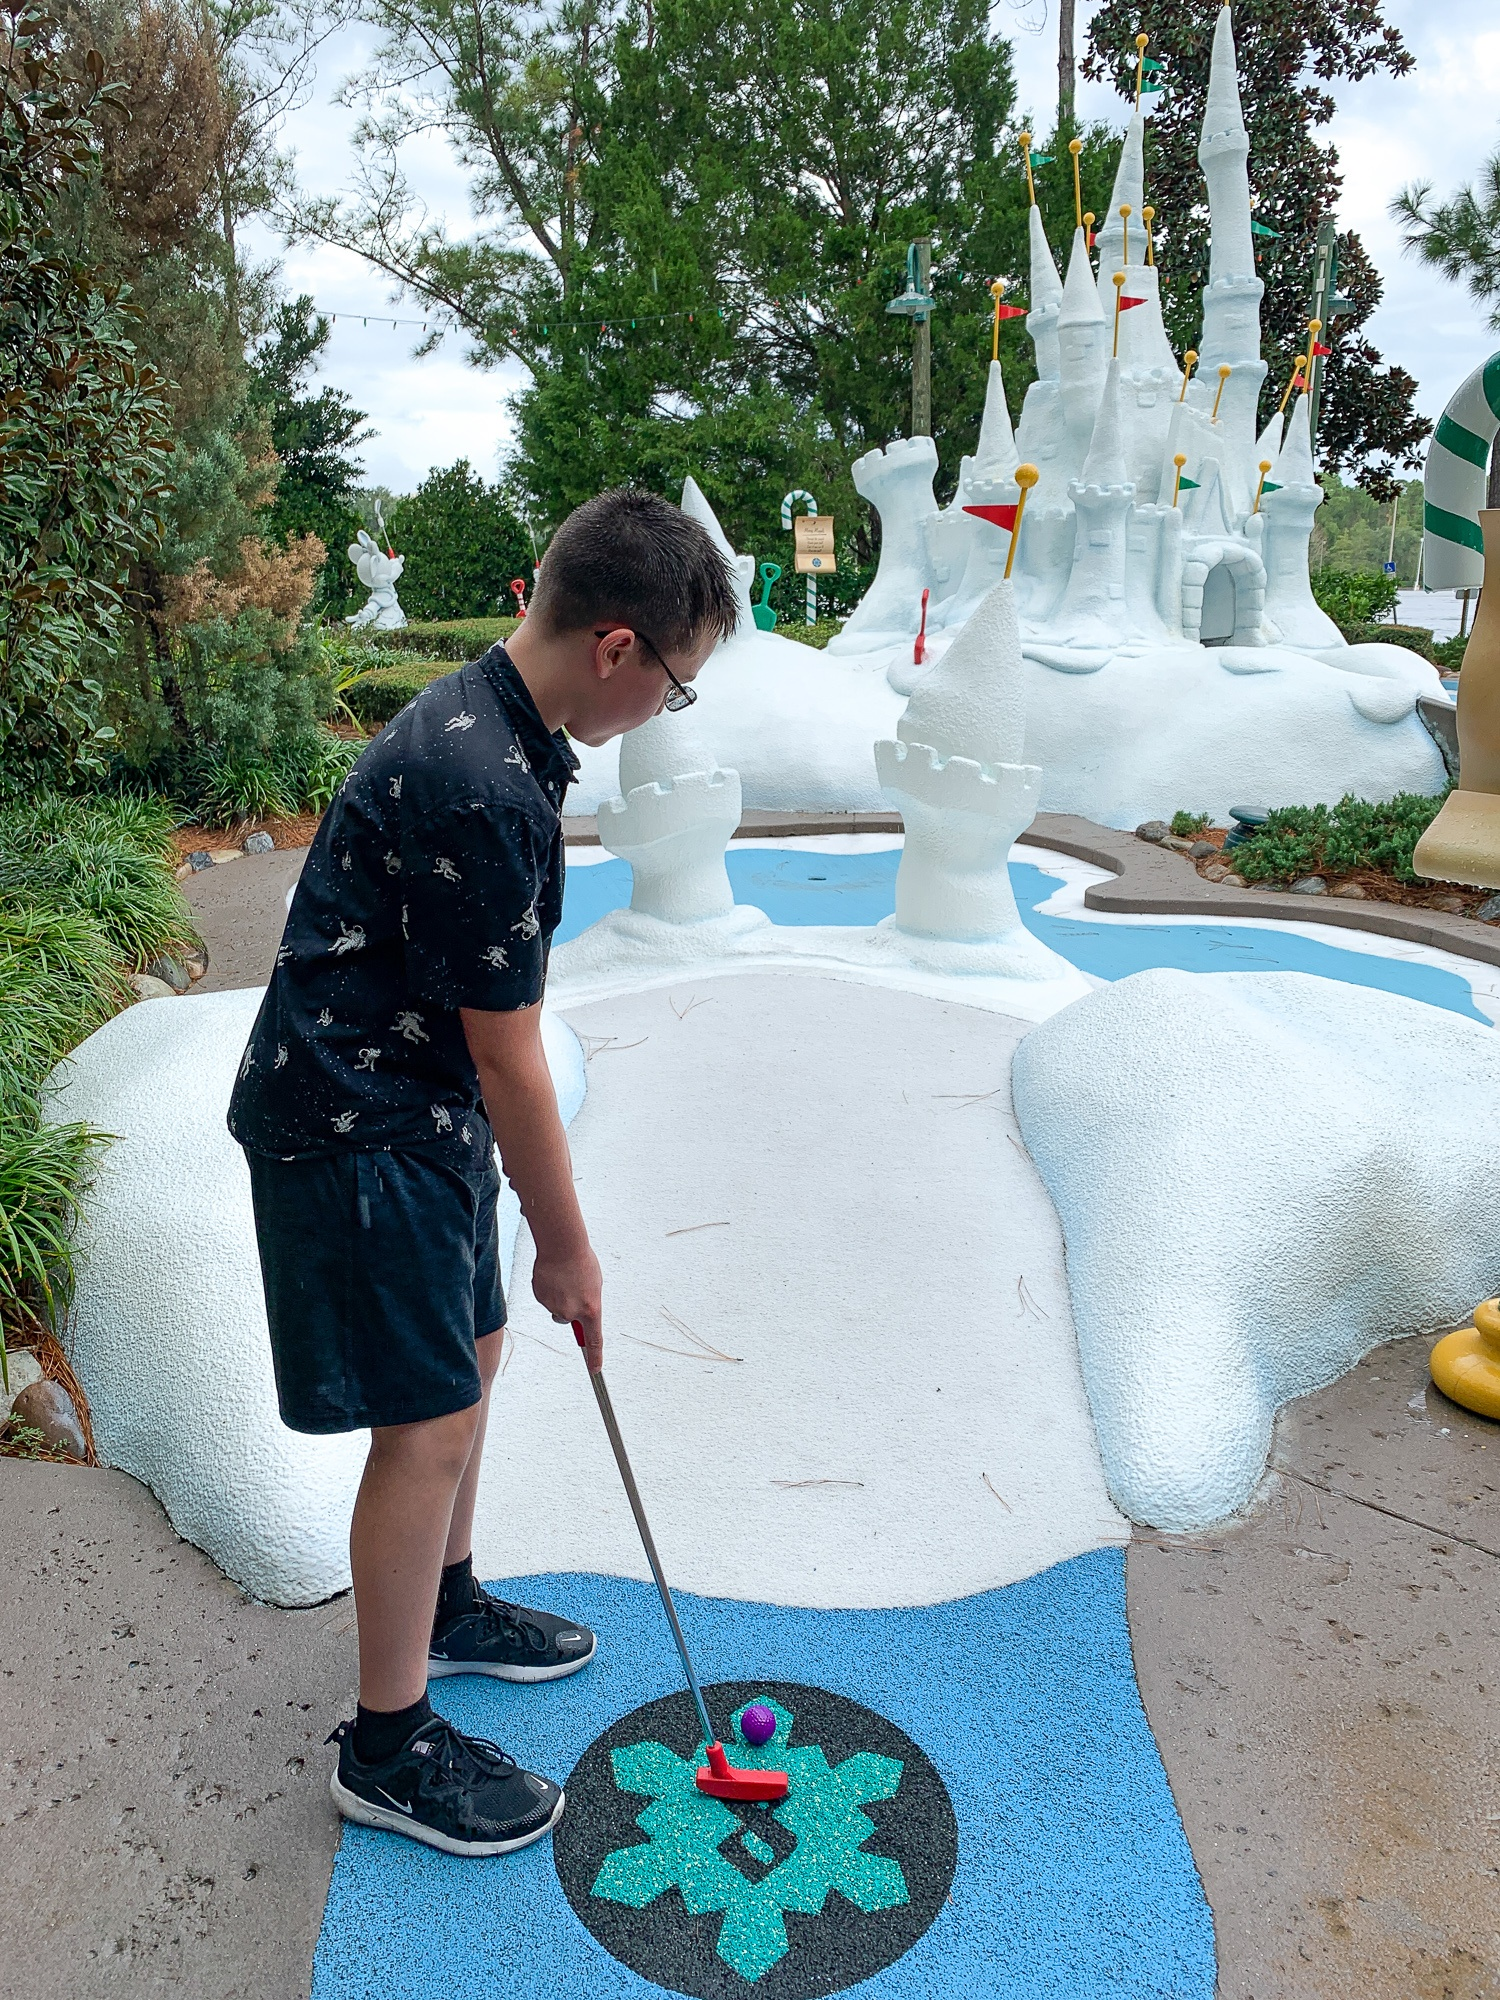 Disney's Winter Summerland Miniature Golf Course